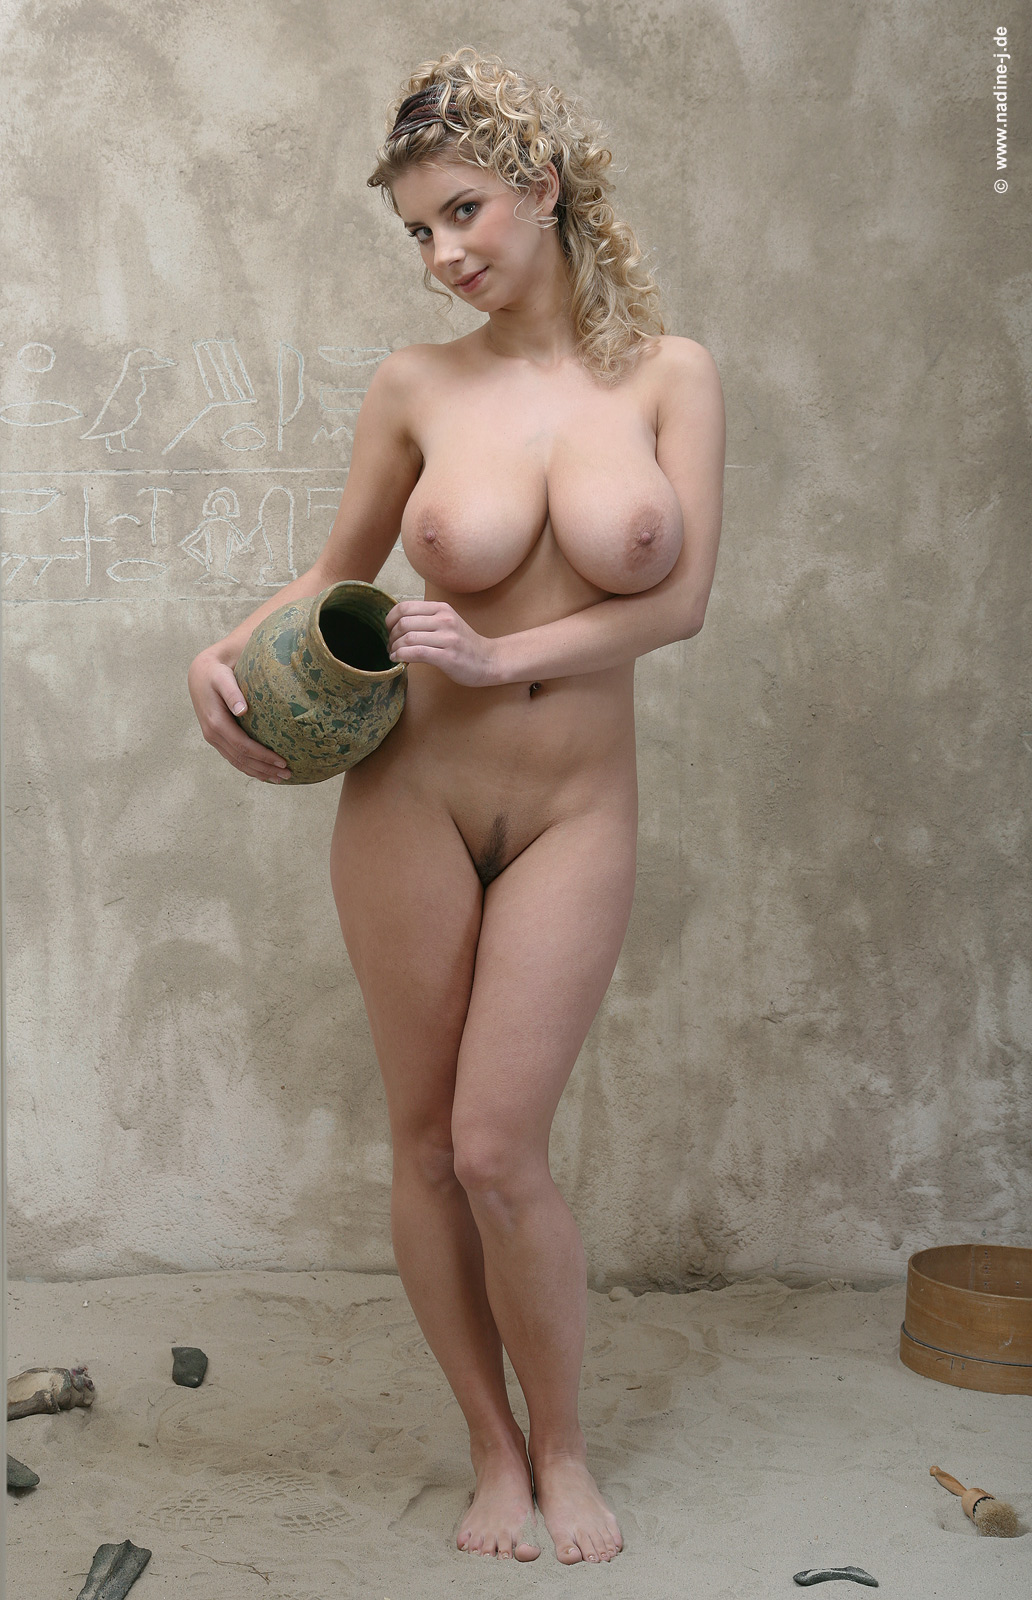 Big boobs katharina from berlin 5